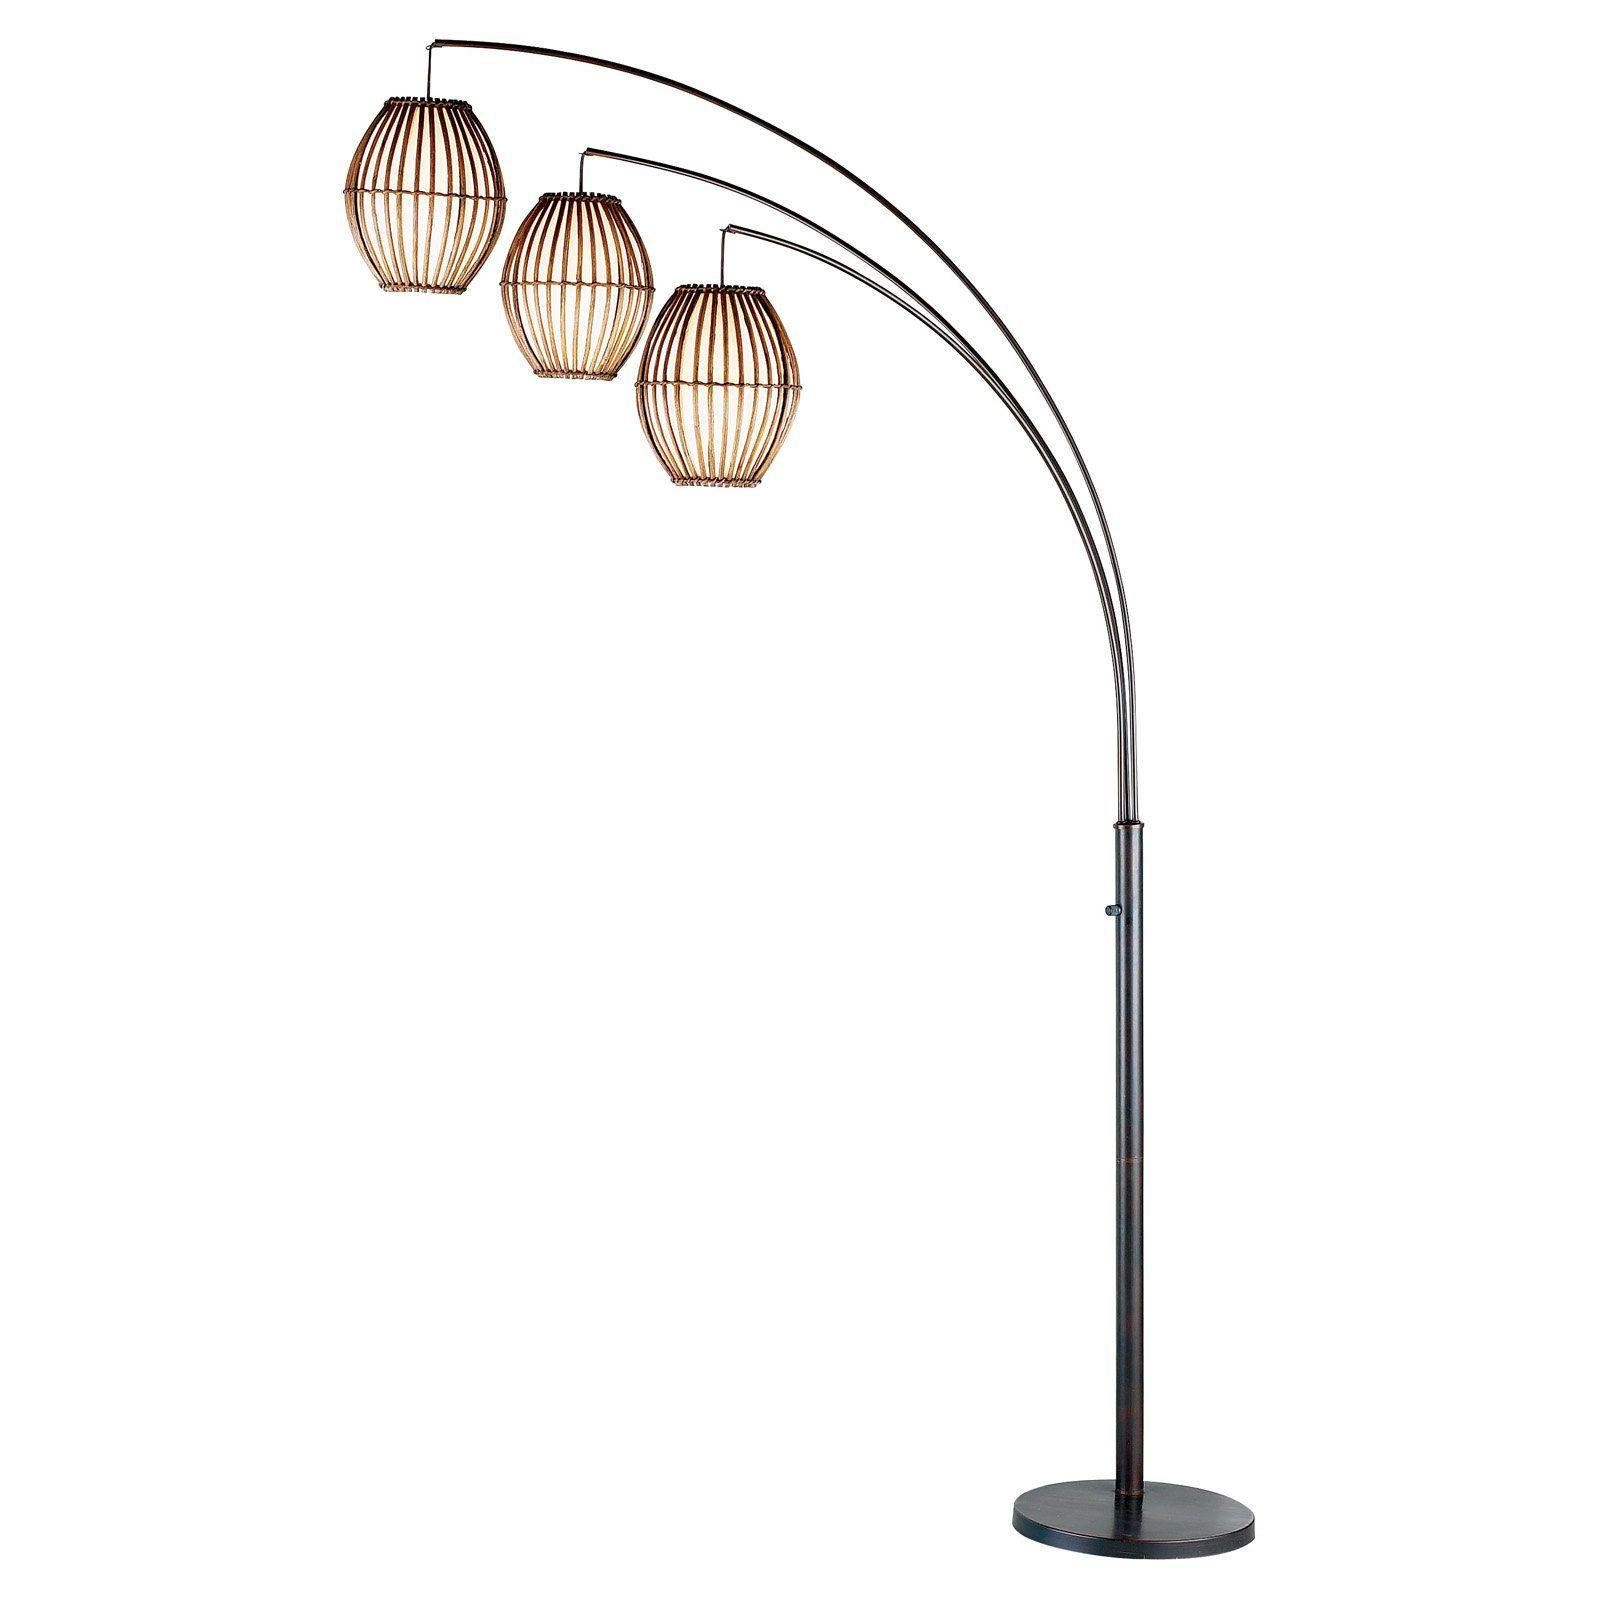 Adesso Maui 4026 Arc Lamp Antique Bronze Arched Floor Lamp Arc Floor Lamps Lamp